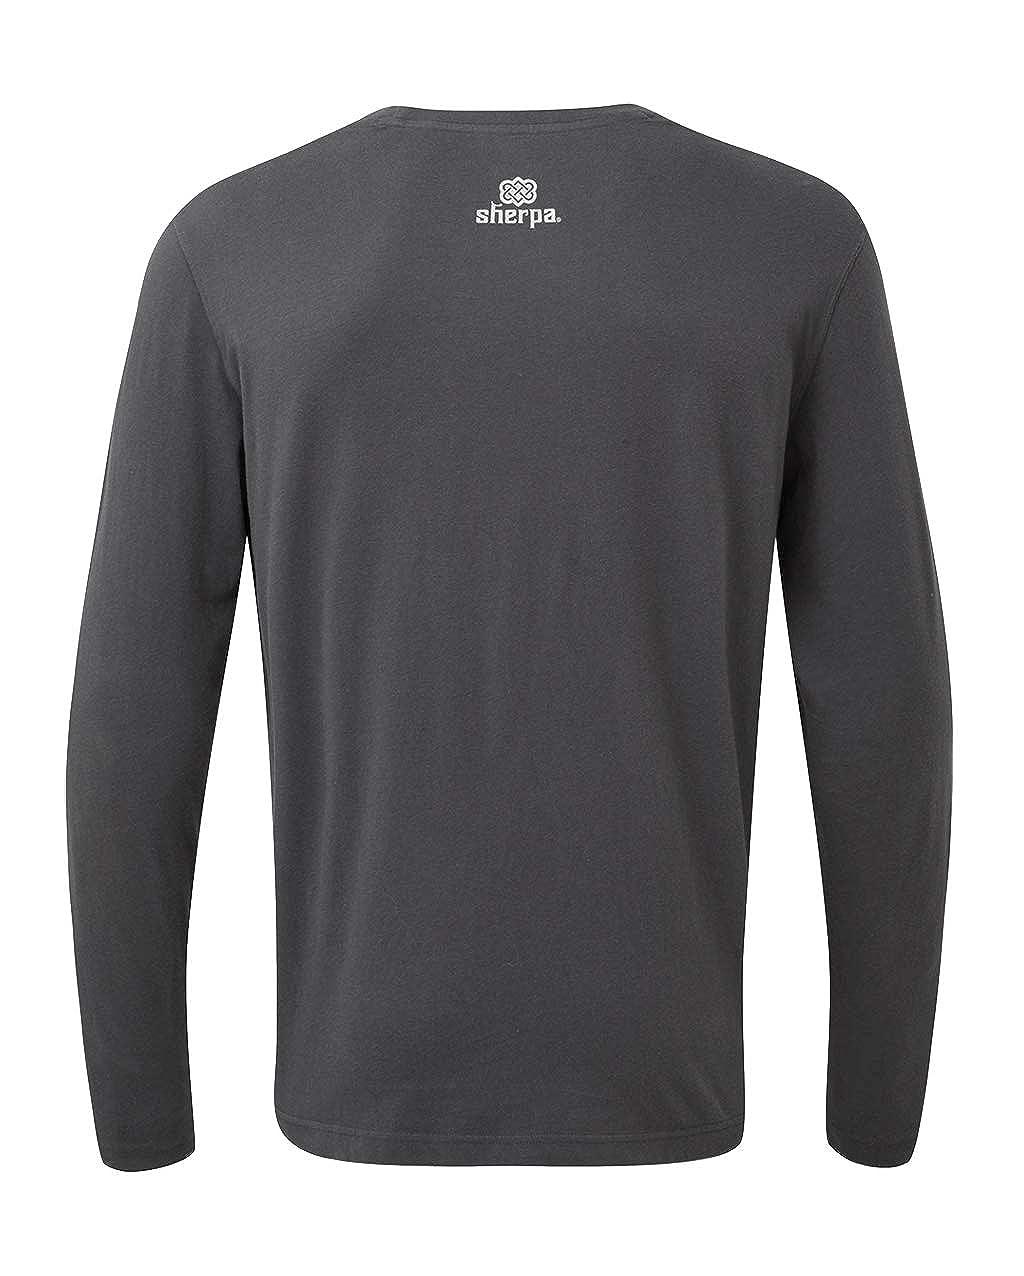 Sherpa Mens Tarcho Long Sleeve Tee Long Sleeve T-Shirt